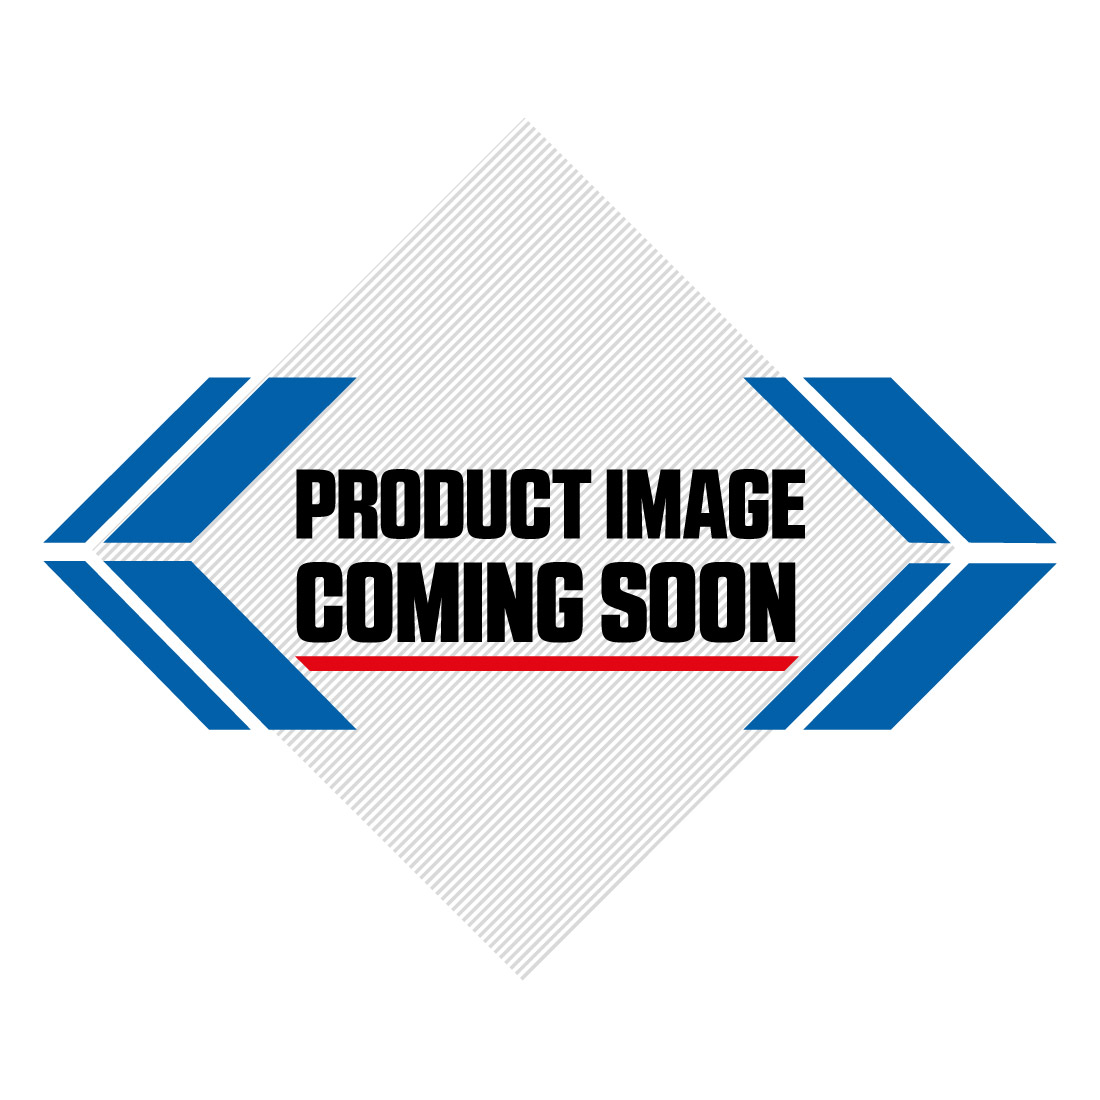 DJI Mavic 2 Pro Drone Image-8>